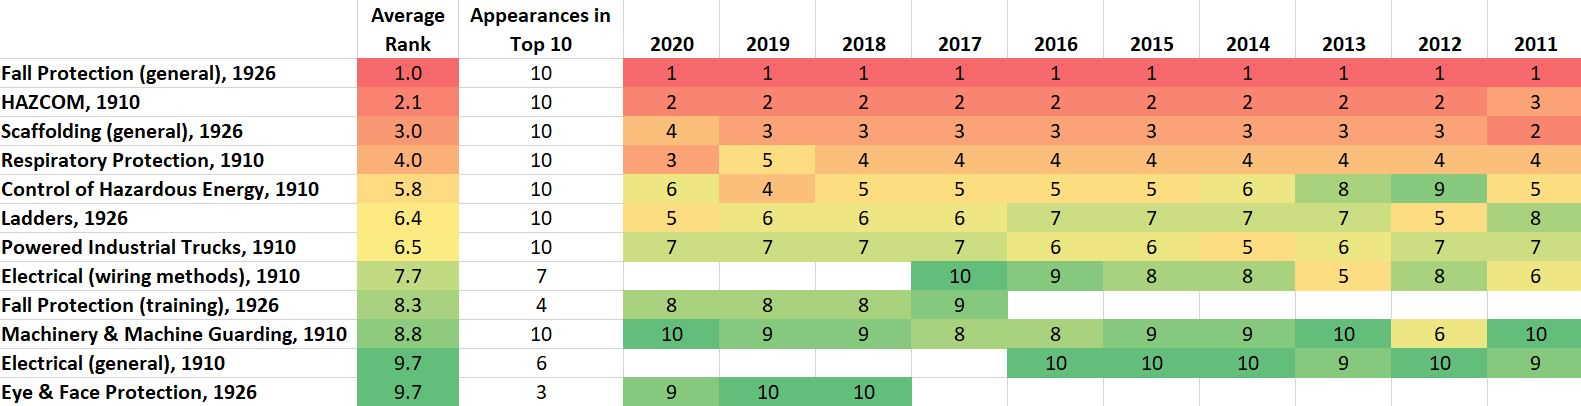 OSHA Top 10 2011 - 2020